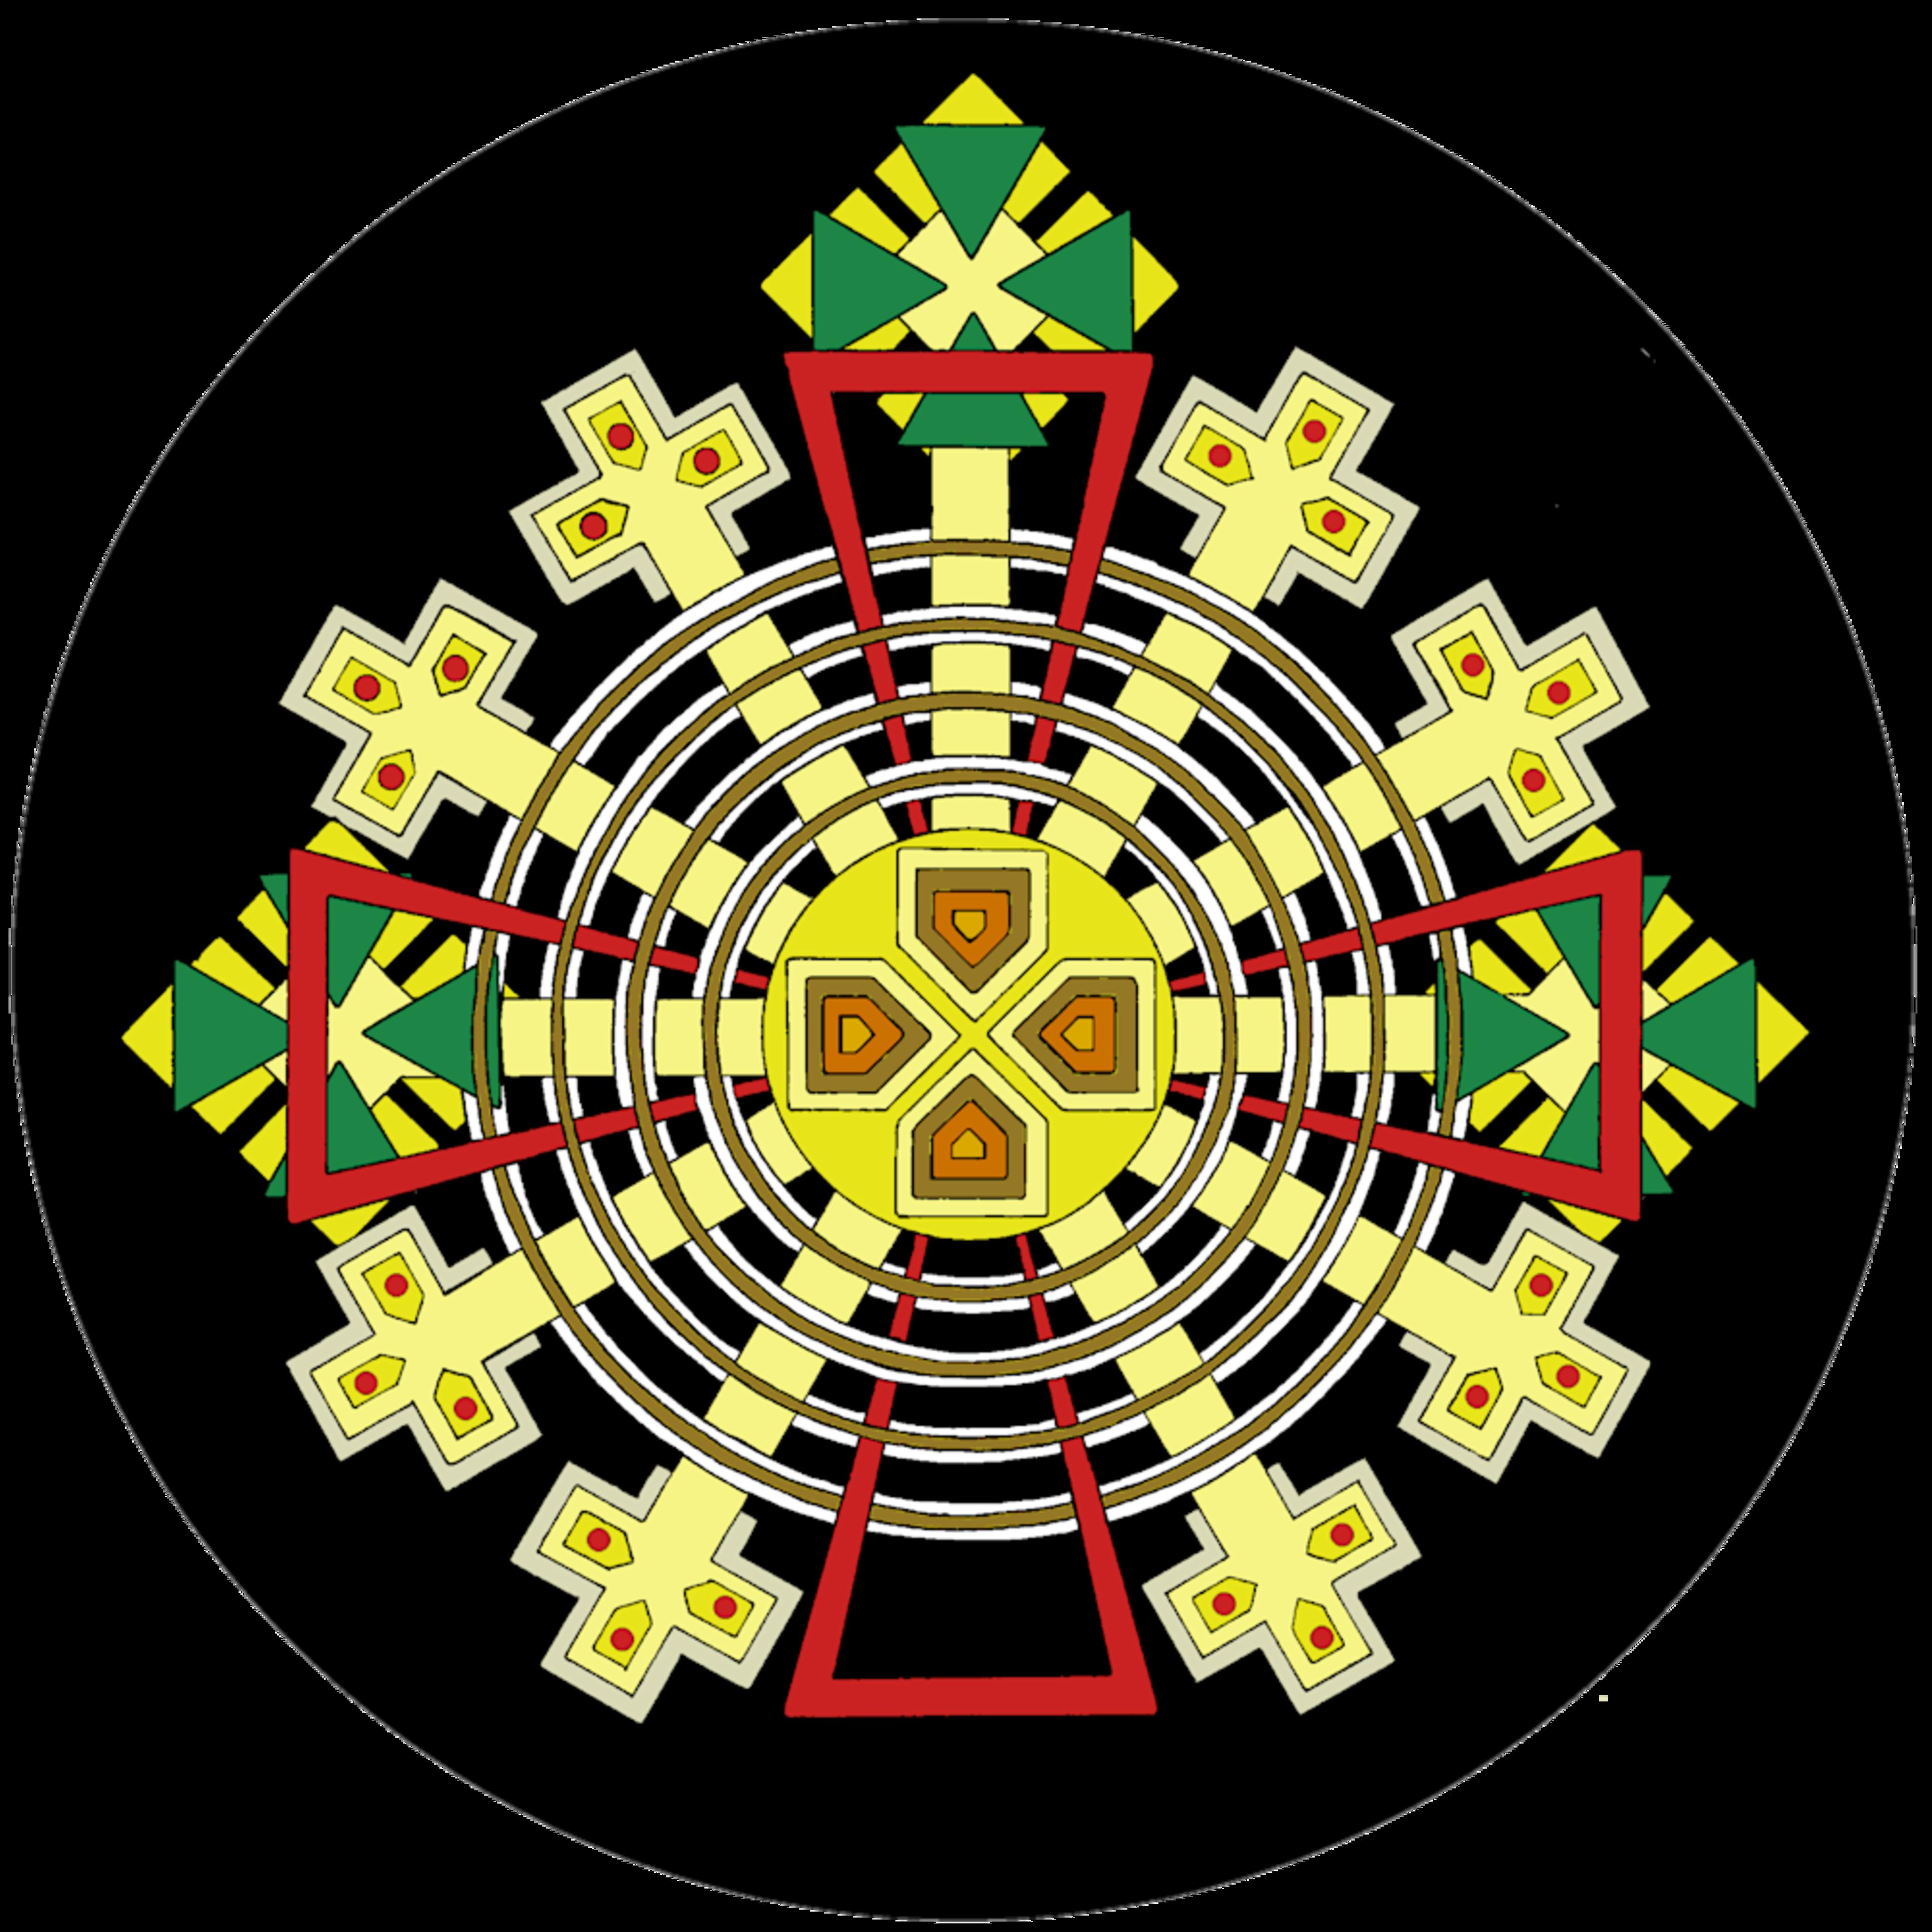 True cross w circle g5bzxf